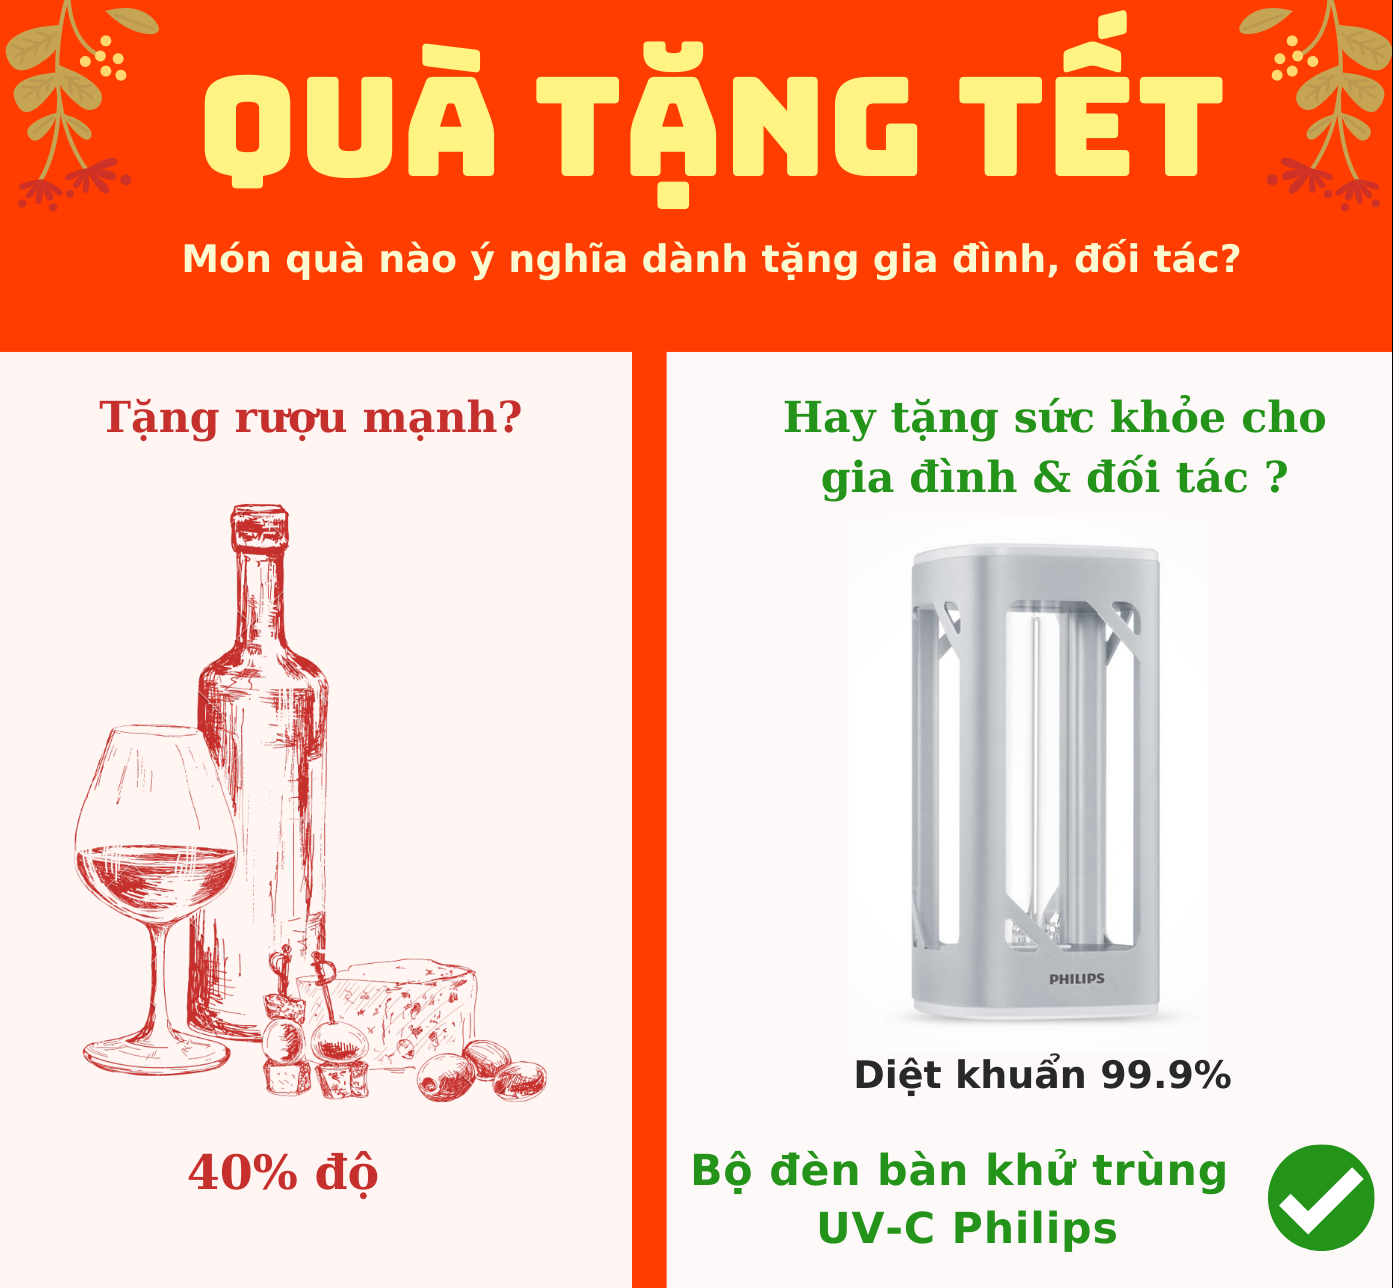 DaiThu Qua Tang Tet Doanh Nghiep 2020 UVC Philips (8)